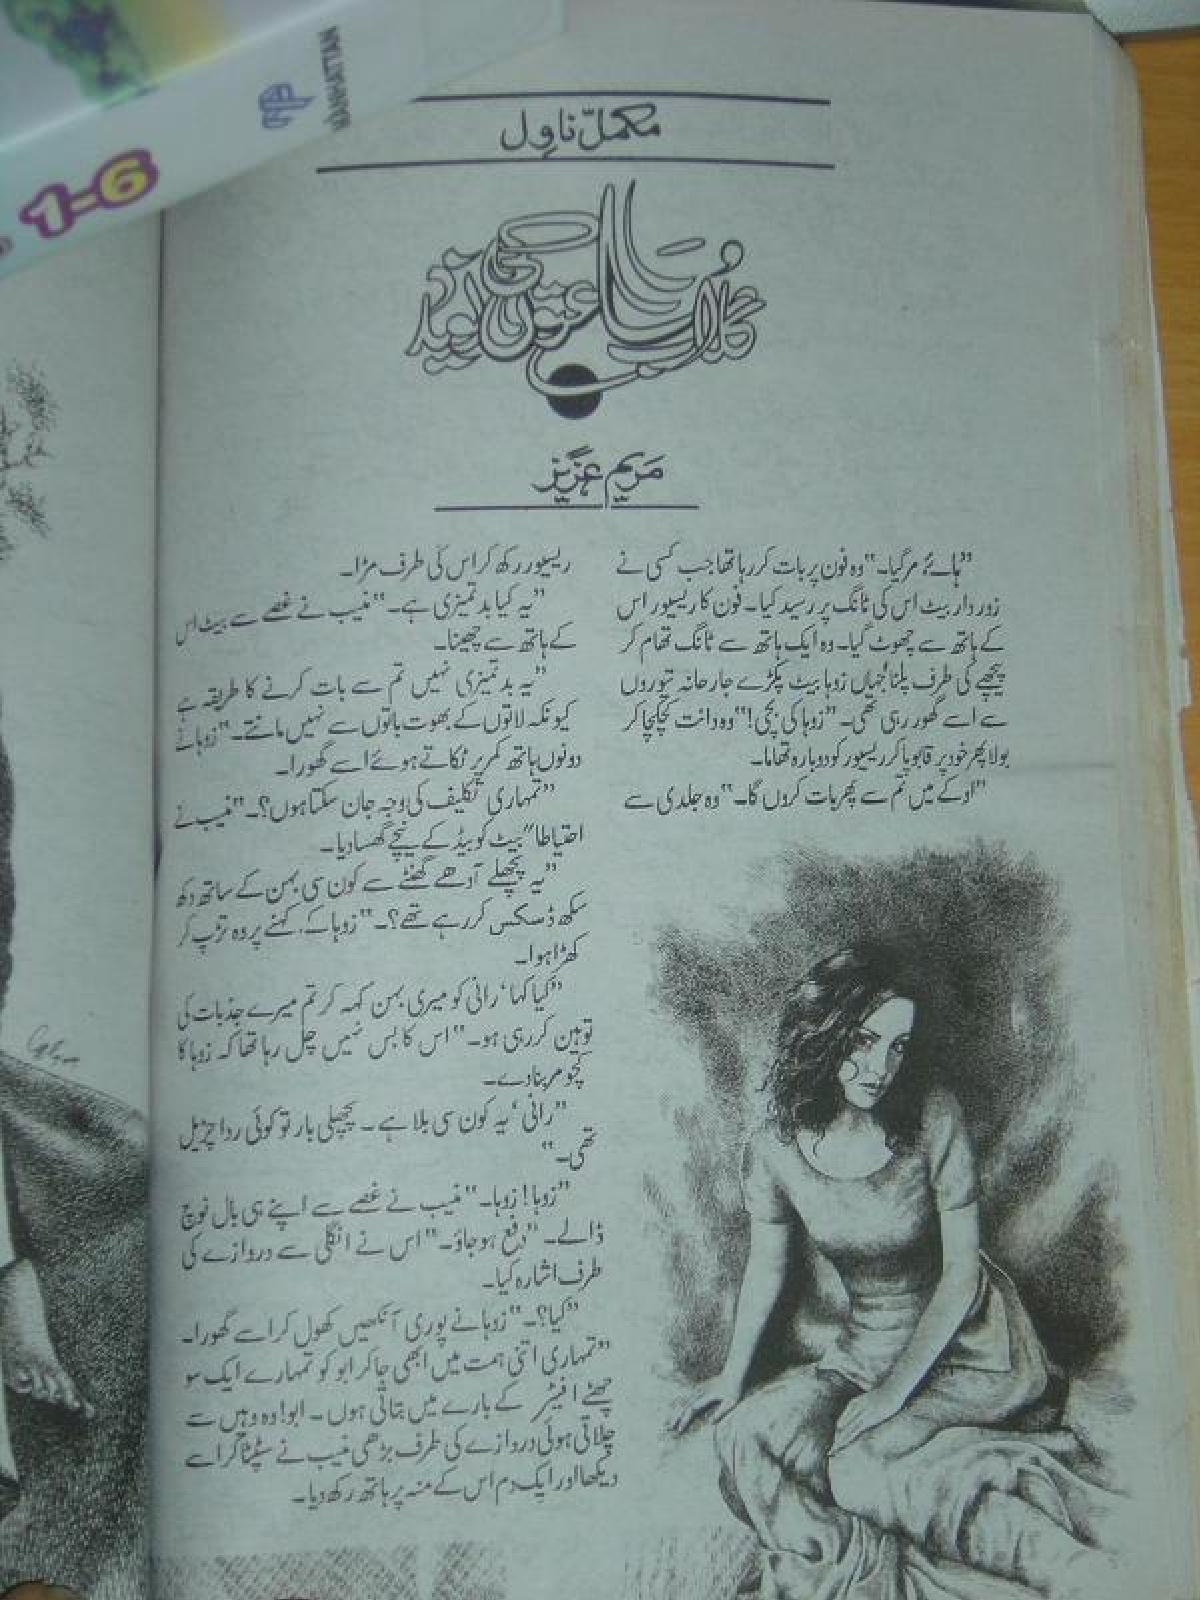 Shahvati irani relate posts dastanhaye shahvati farsi at askives film